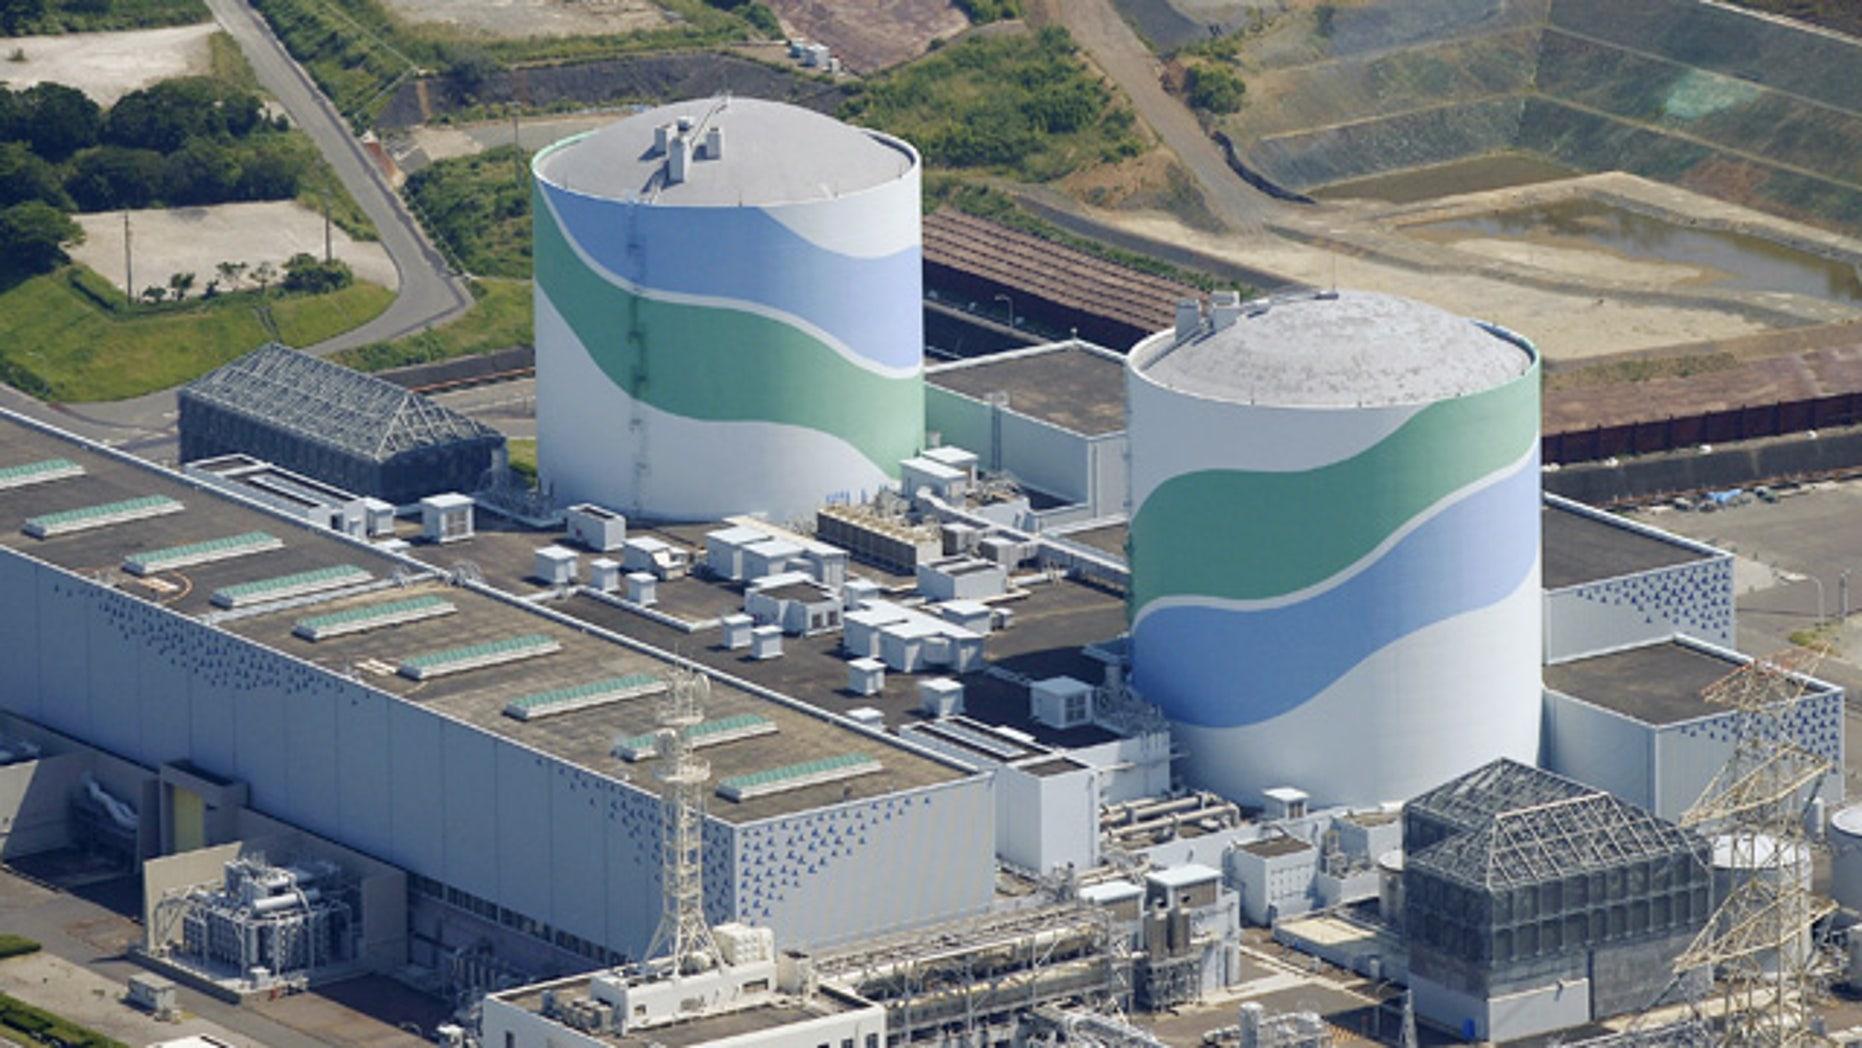 Aug. 11, 2015: This aerial photo shows reactors of No. 1, right, and No. 2, left,  at the Sendai Nuclear Power Station in Satsumasendai, Kagoshima prefecture, southern Japan. (Kyodo News via AP)